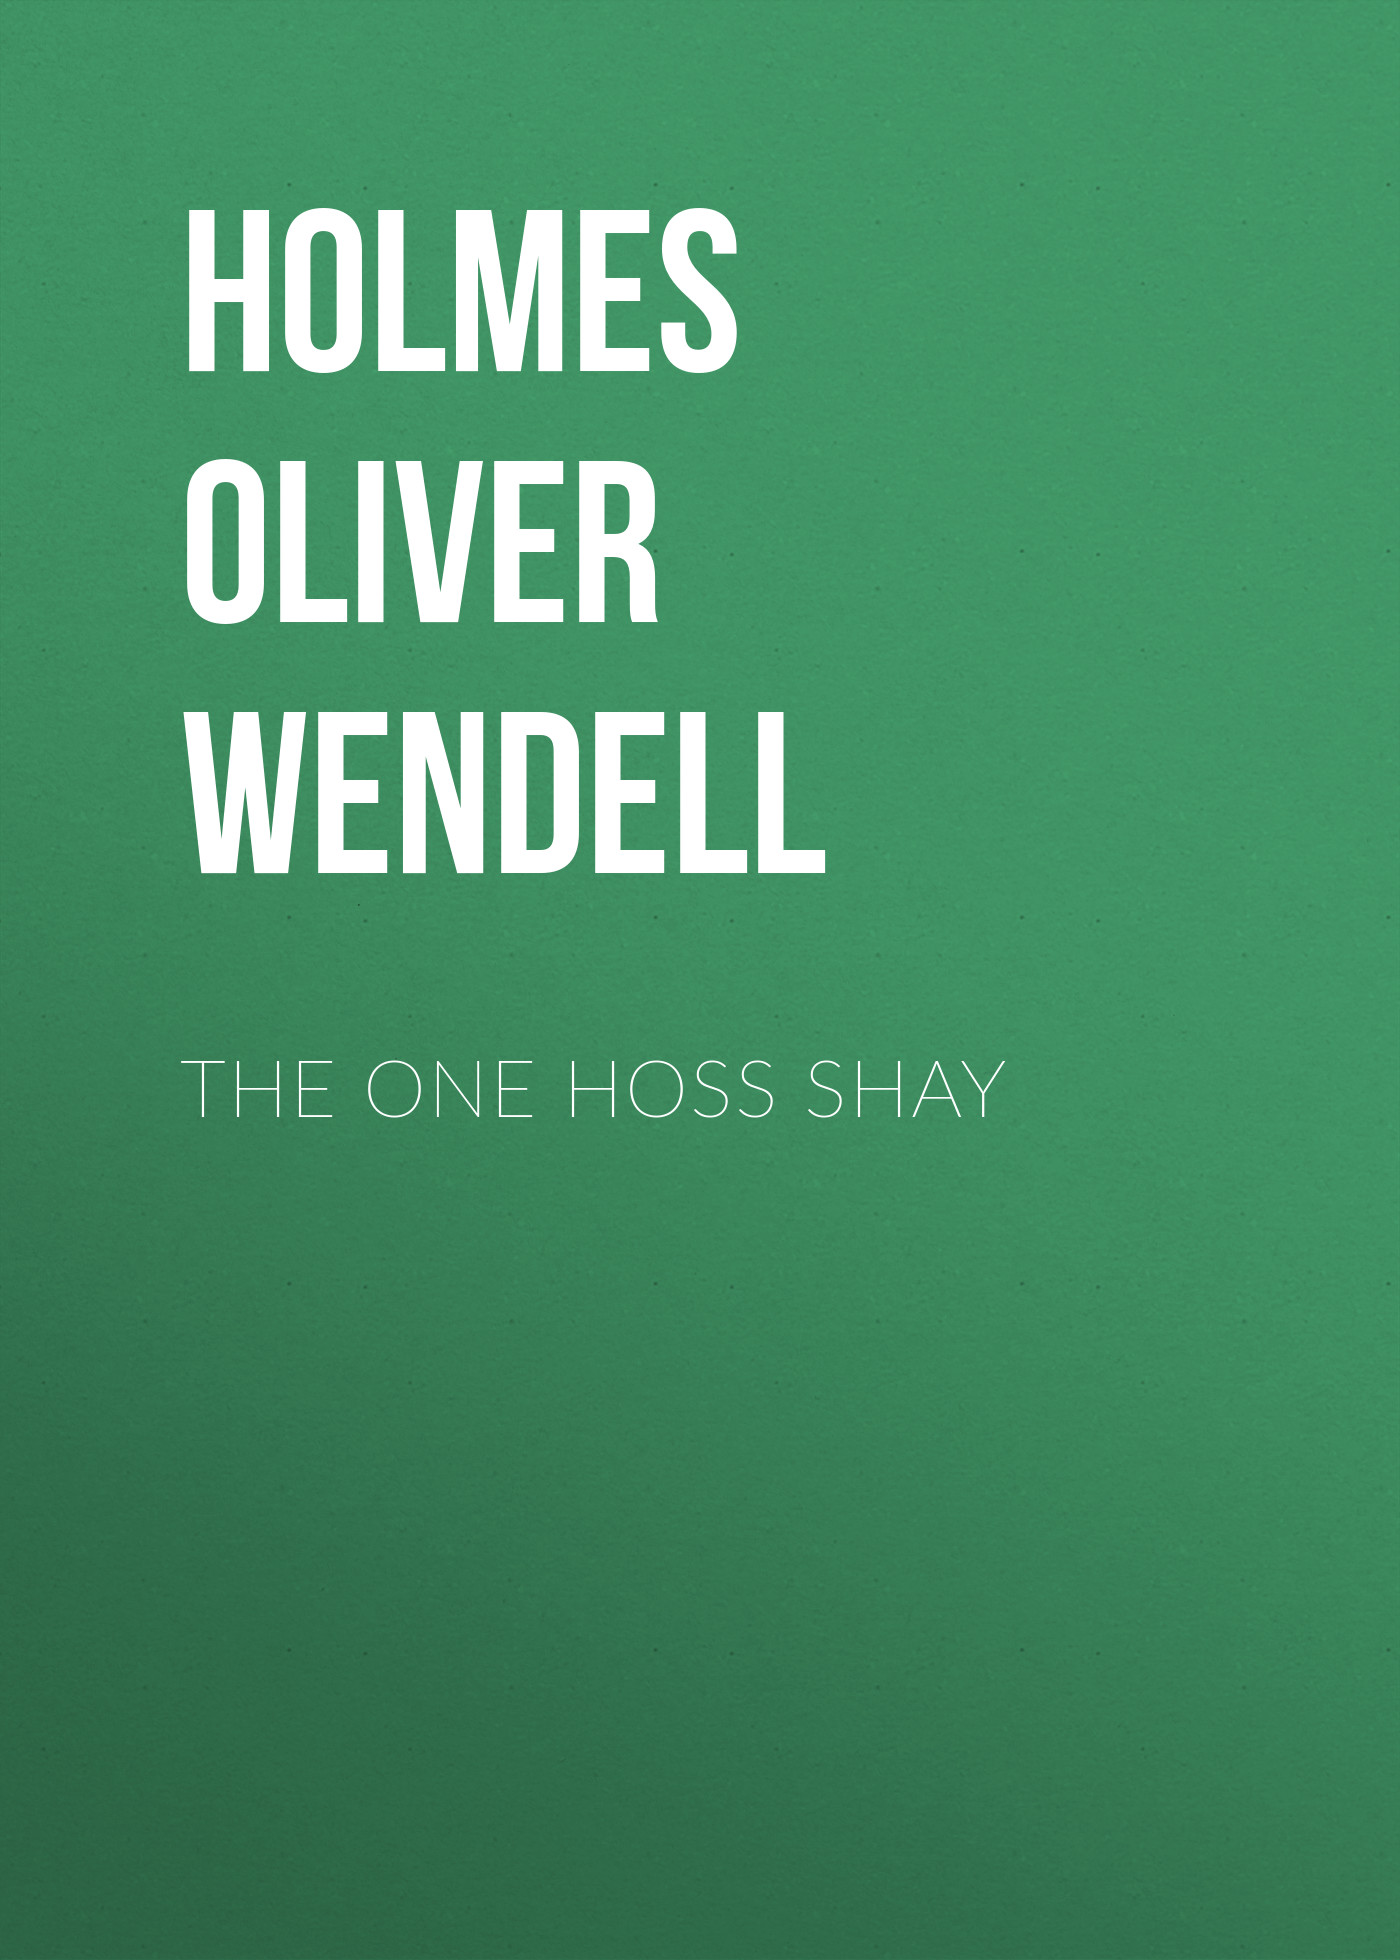 Holmes Oliver Wendell The One Hoss Shay oliver wendell holmes holmes–pollock letters – the correspondence of mr justice holmes